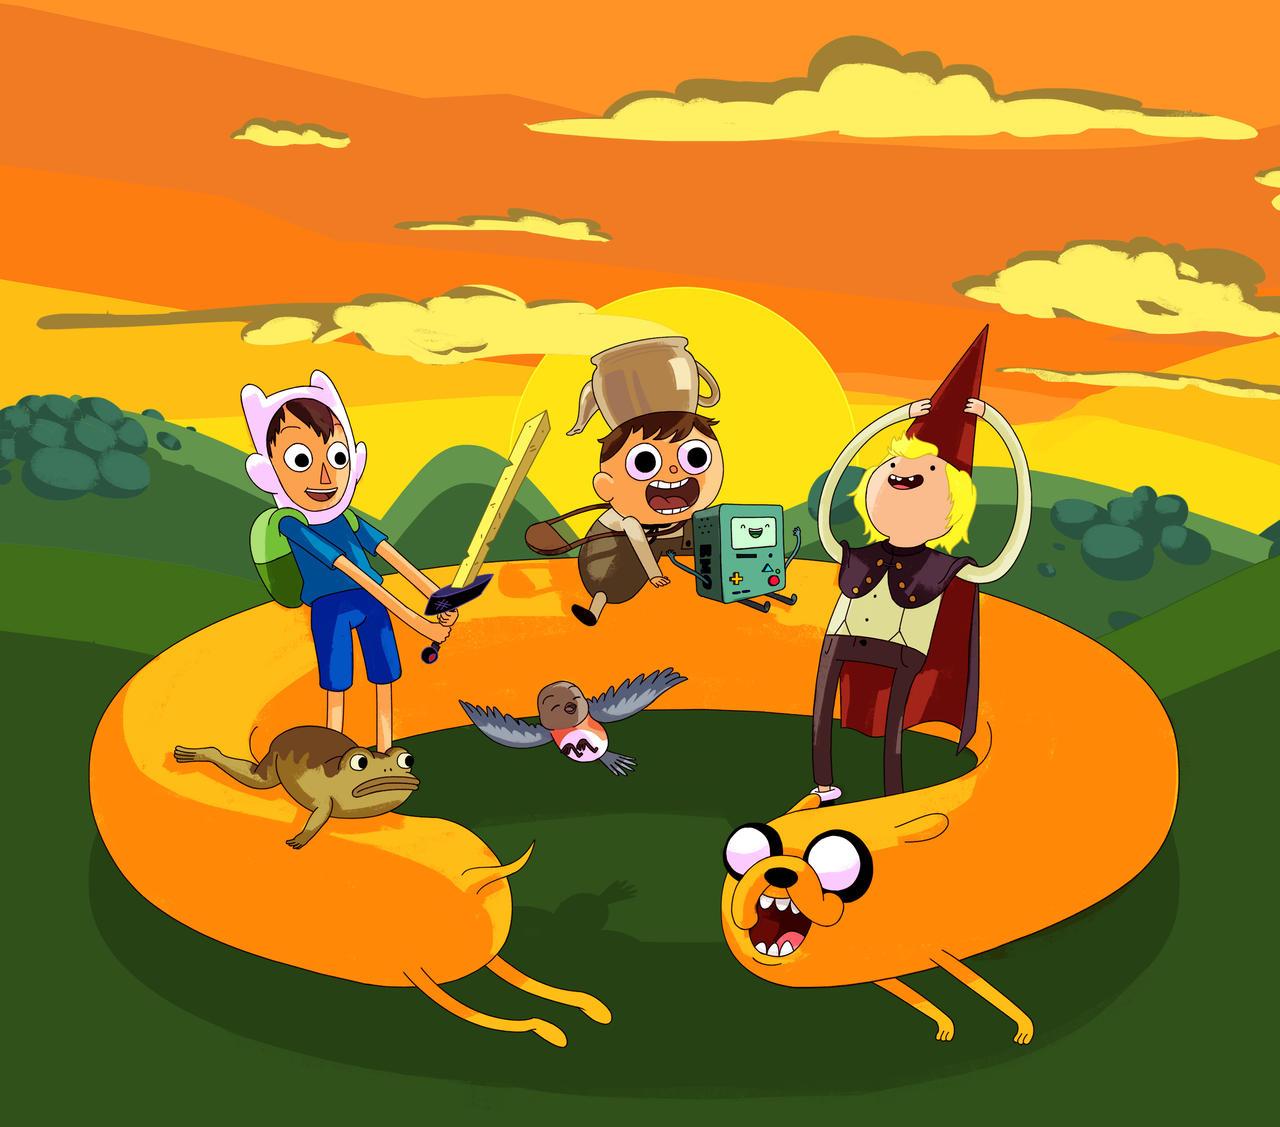 Adventure Time Over The Garden Wall Mashup By Yasada On Deviantart